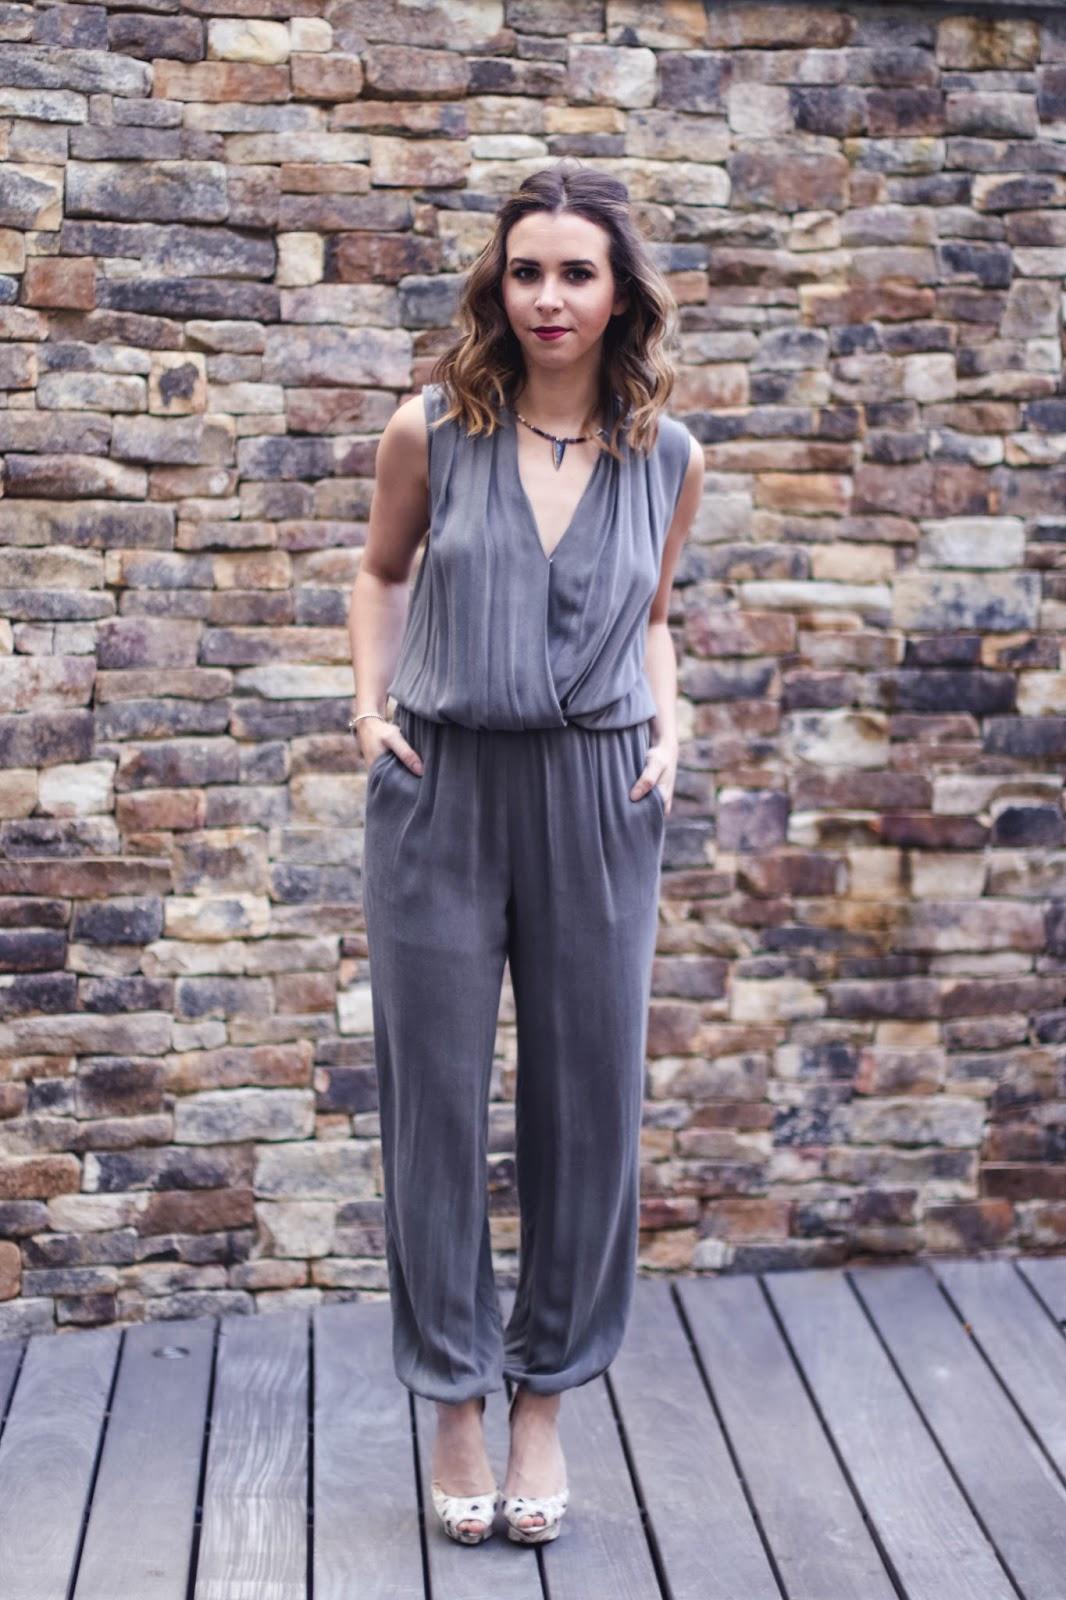 Fashion-for-Paws-2017-A-Viza-Style-jumpsuit-undeniable-boutique-mosaic-district